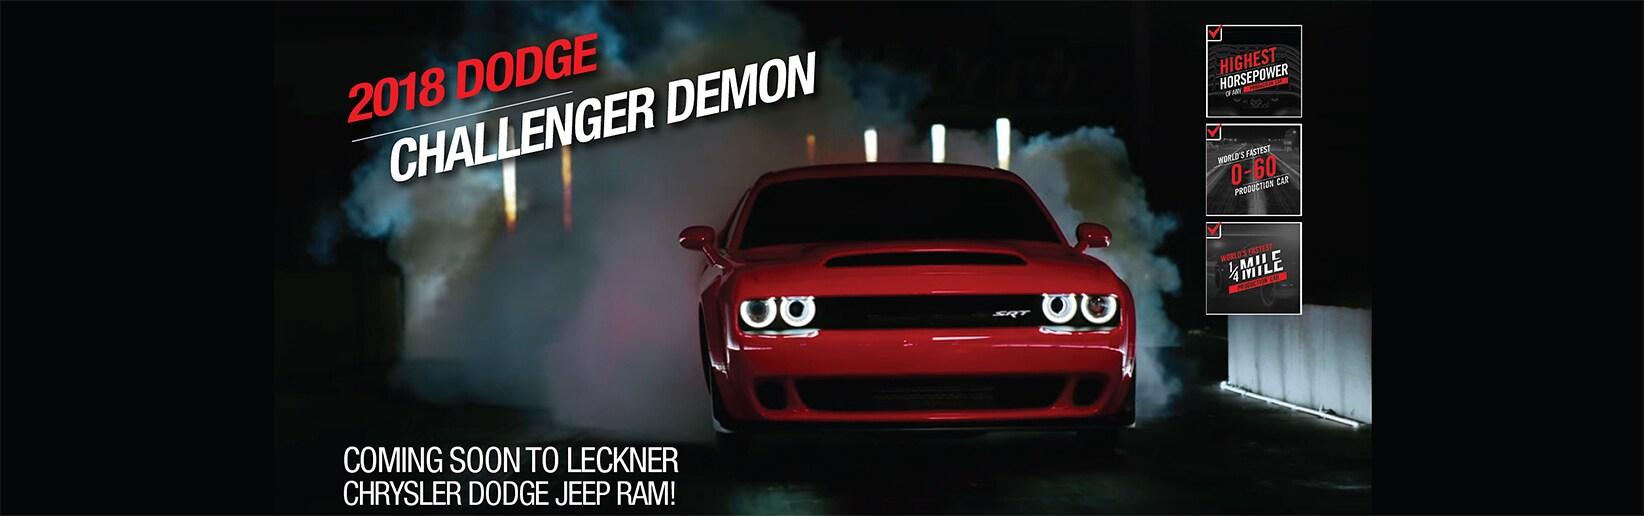 Leckner Chrysler Dodge Jeep Ram | King George, VA | New ...